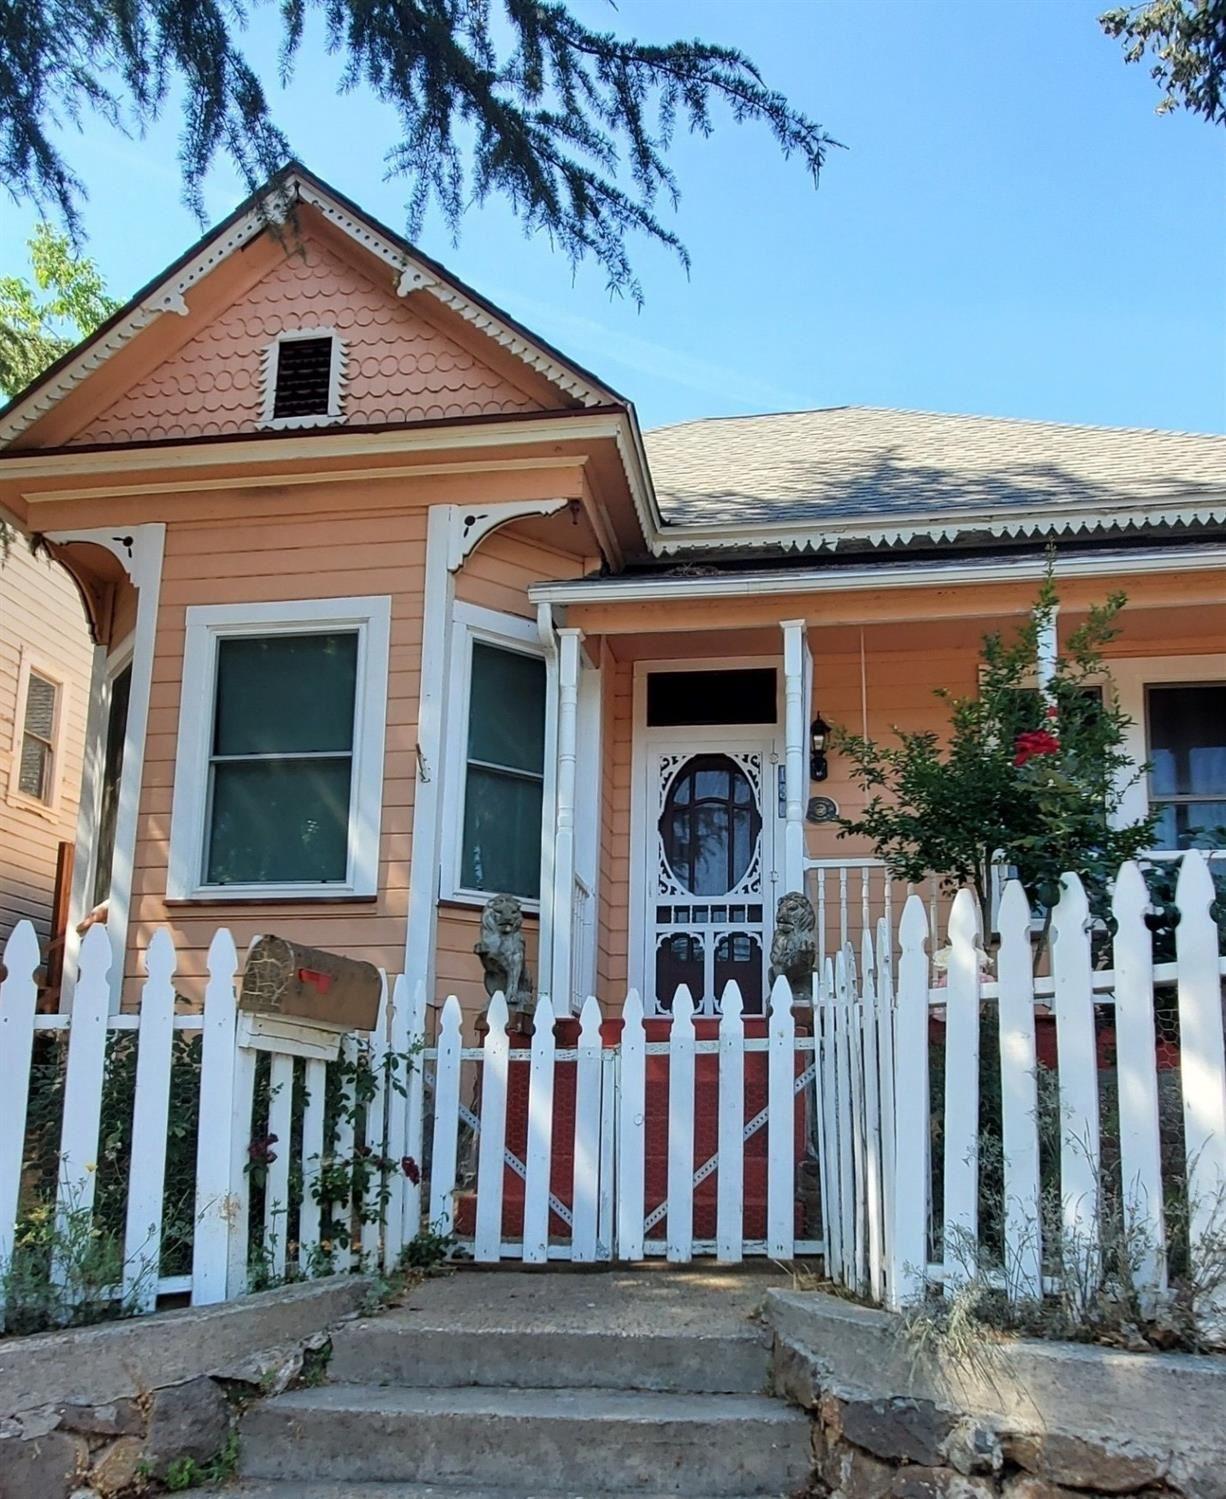 130 Richardson St, Grass Valley, CA 95945 - MLS#: 221074844